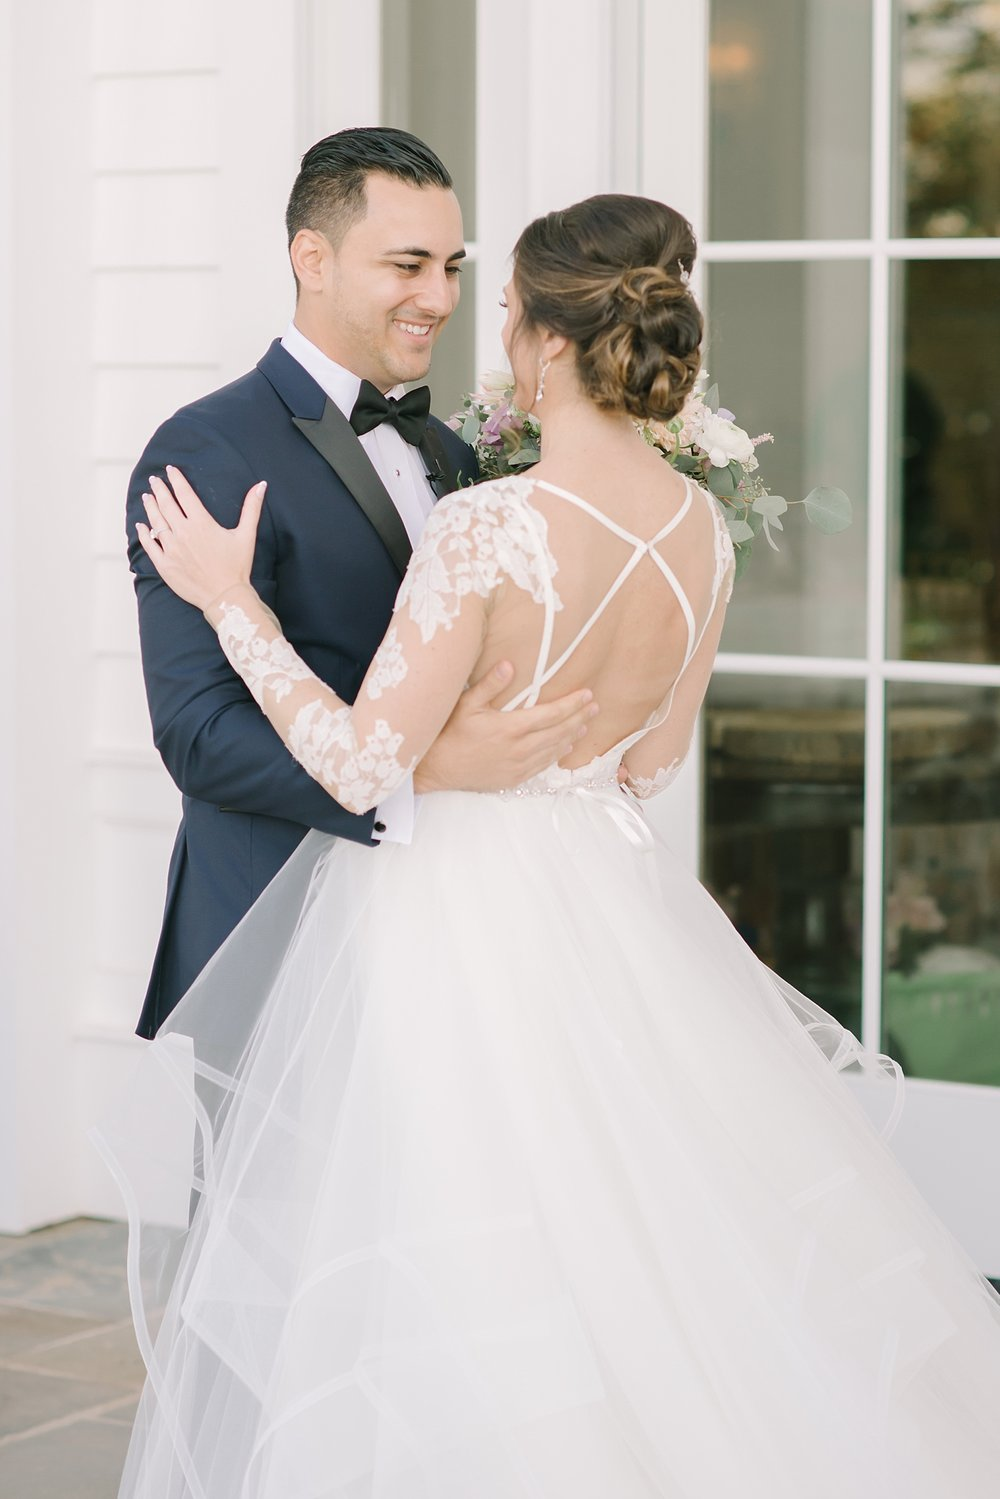 ryland_inn_nj_wedding_photography_0025.jpg